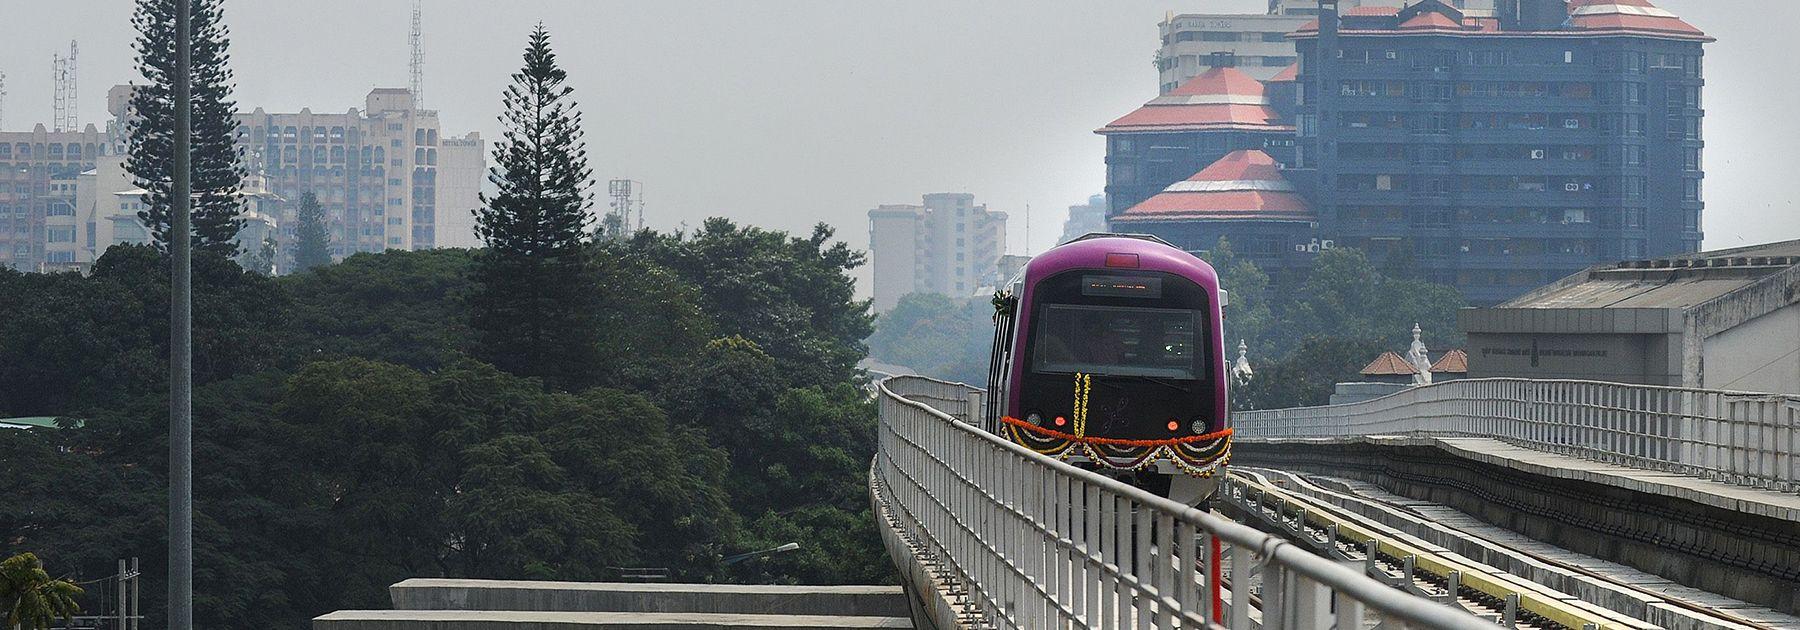 The Bangalore Metro Rail Corporation's Namma metro train. (DIBYANGSHU SARKAR/AFP/Getty Images)